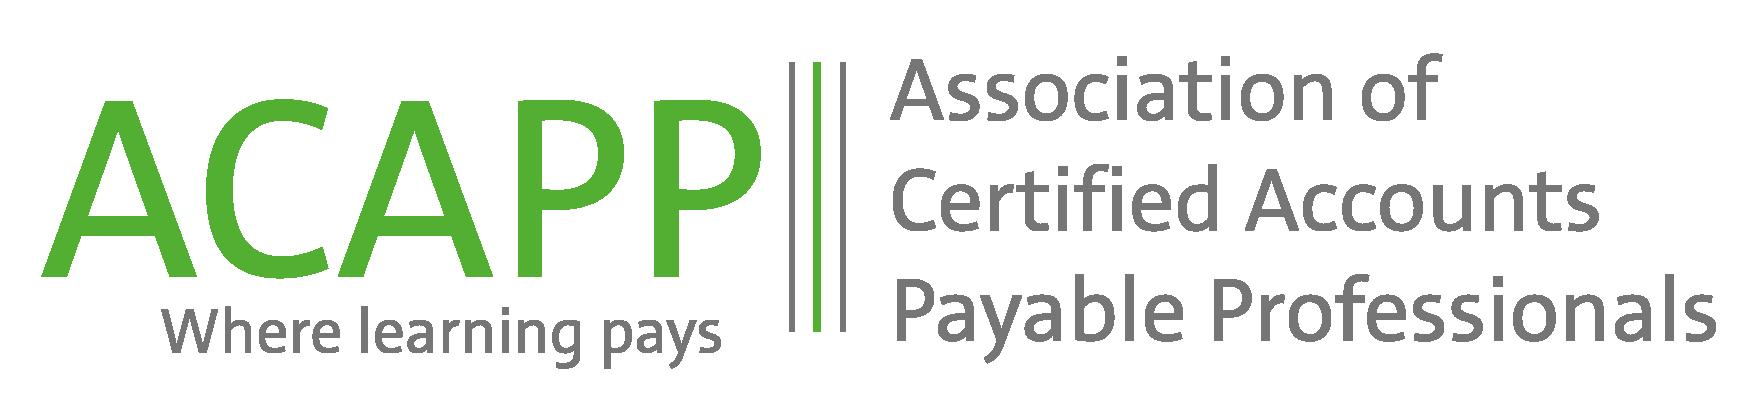 ACAPP Virtual Academy UK